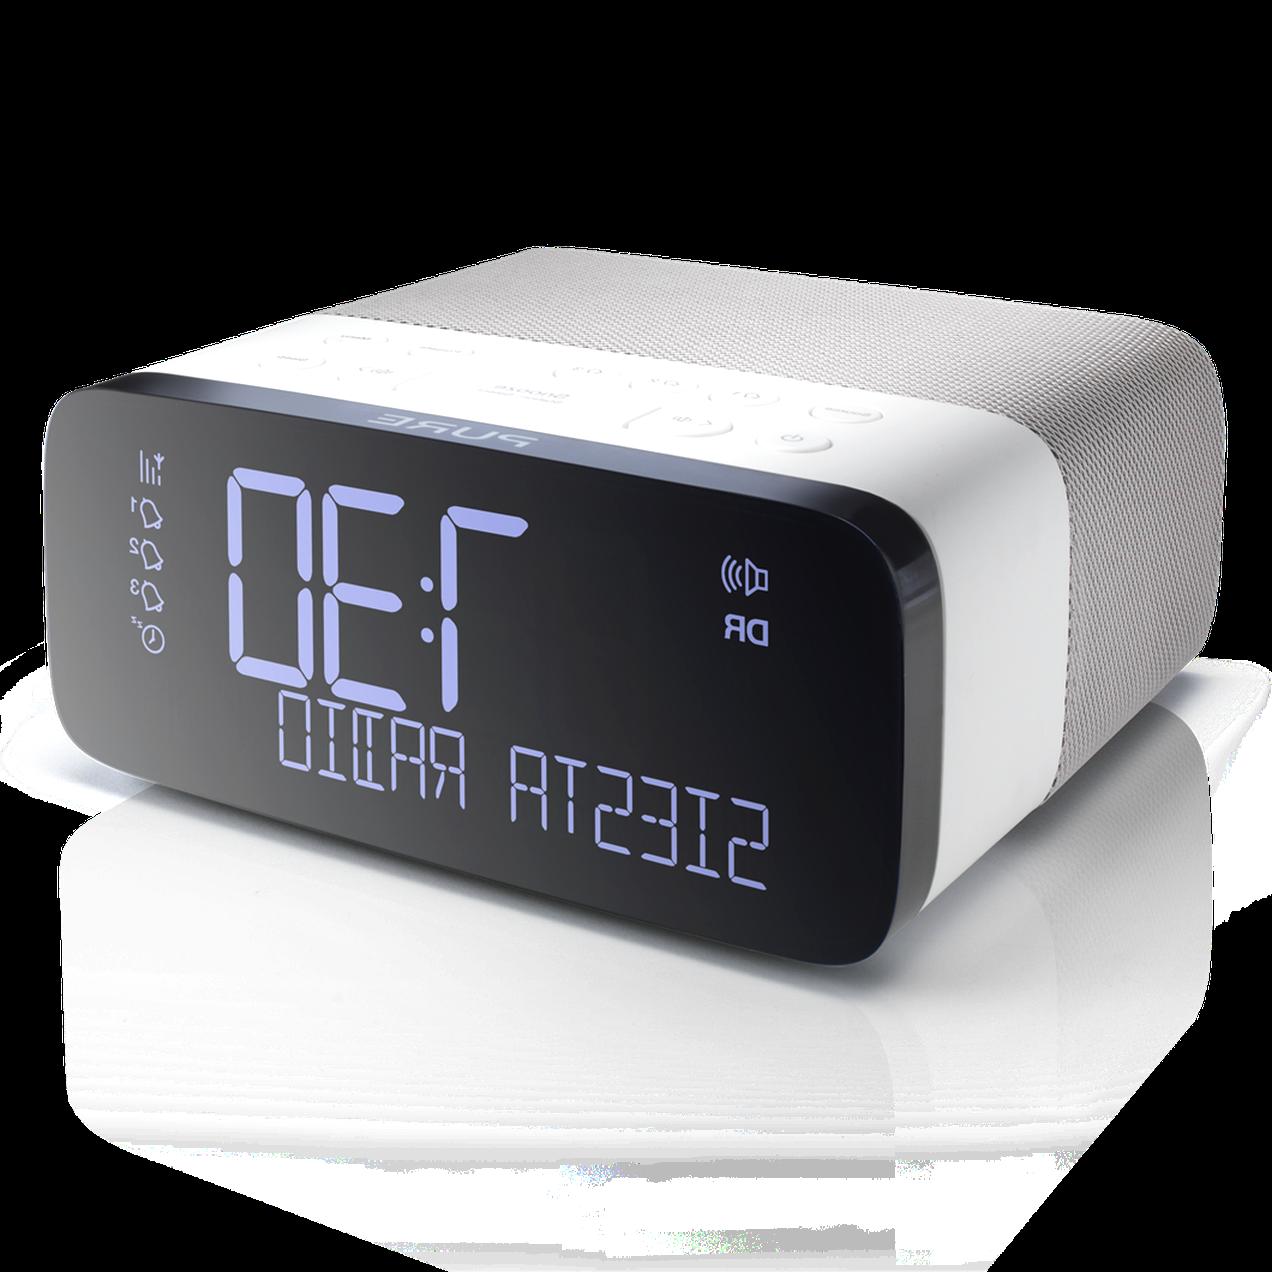 pure clock radio for sale